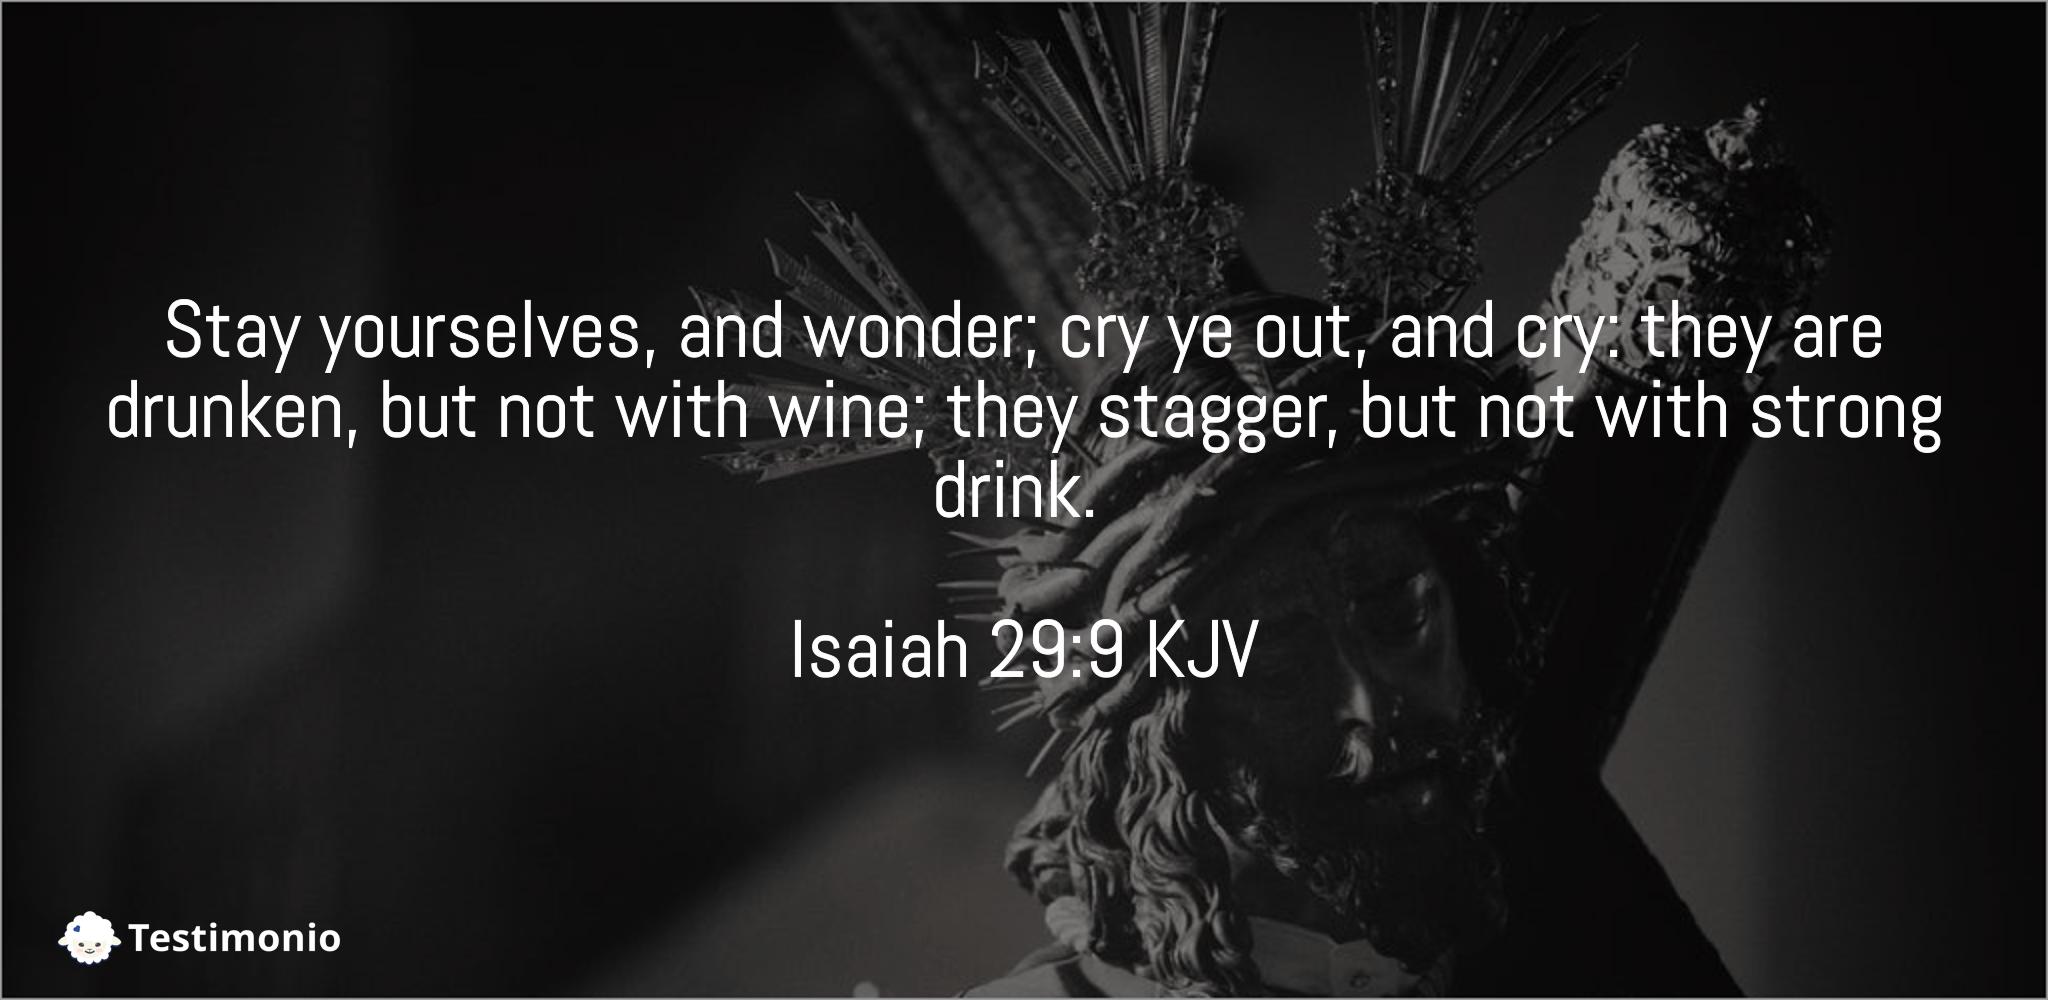 Isaiah 29:9